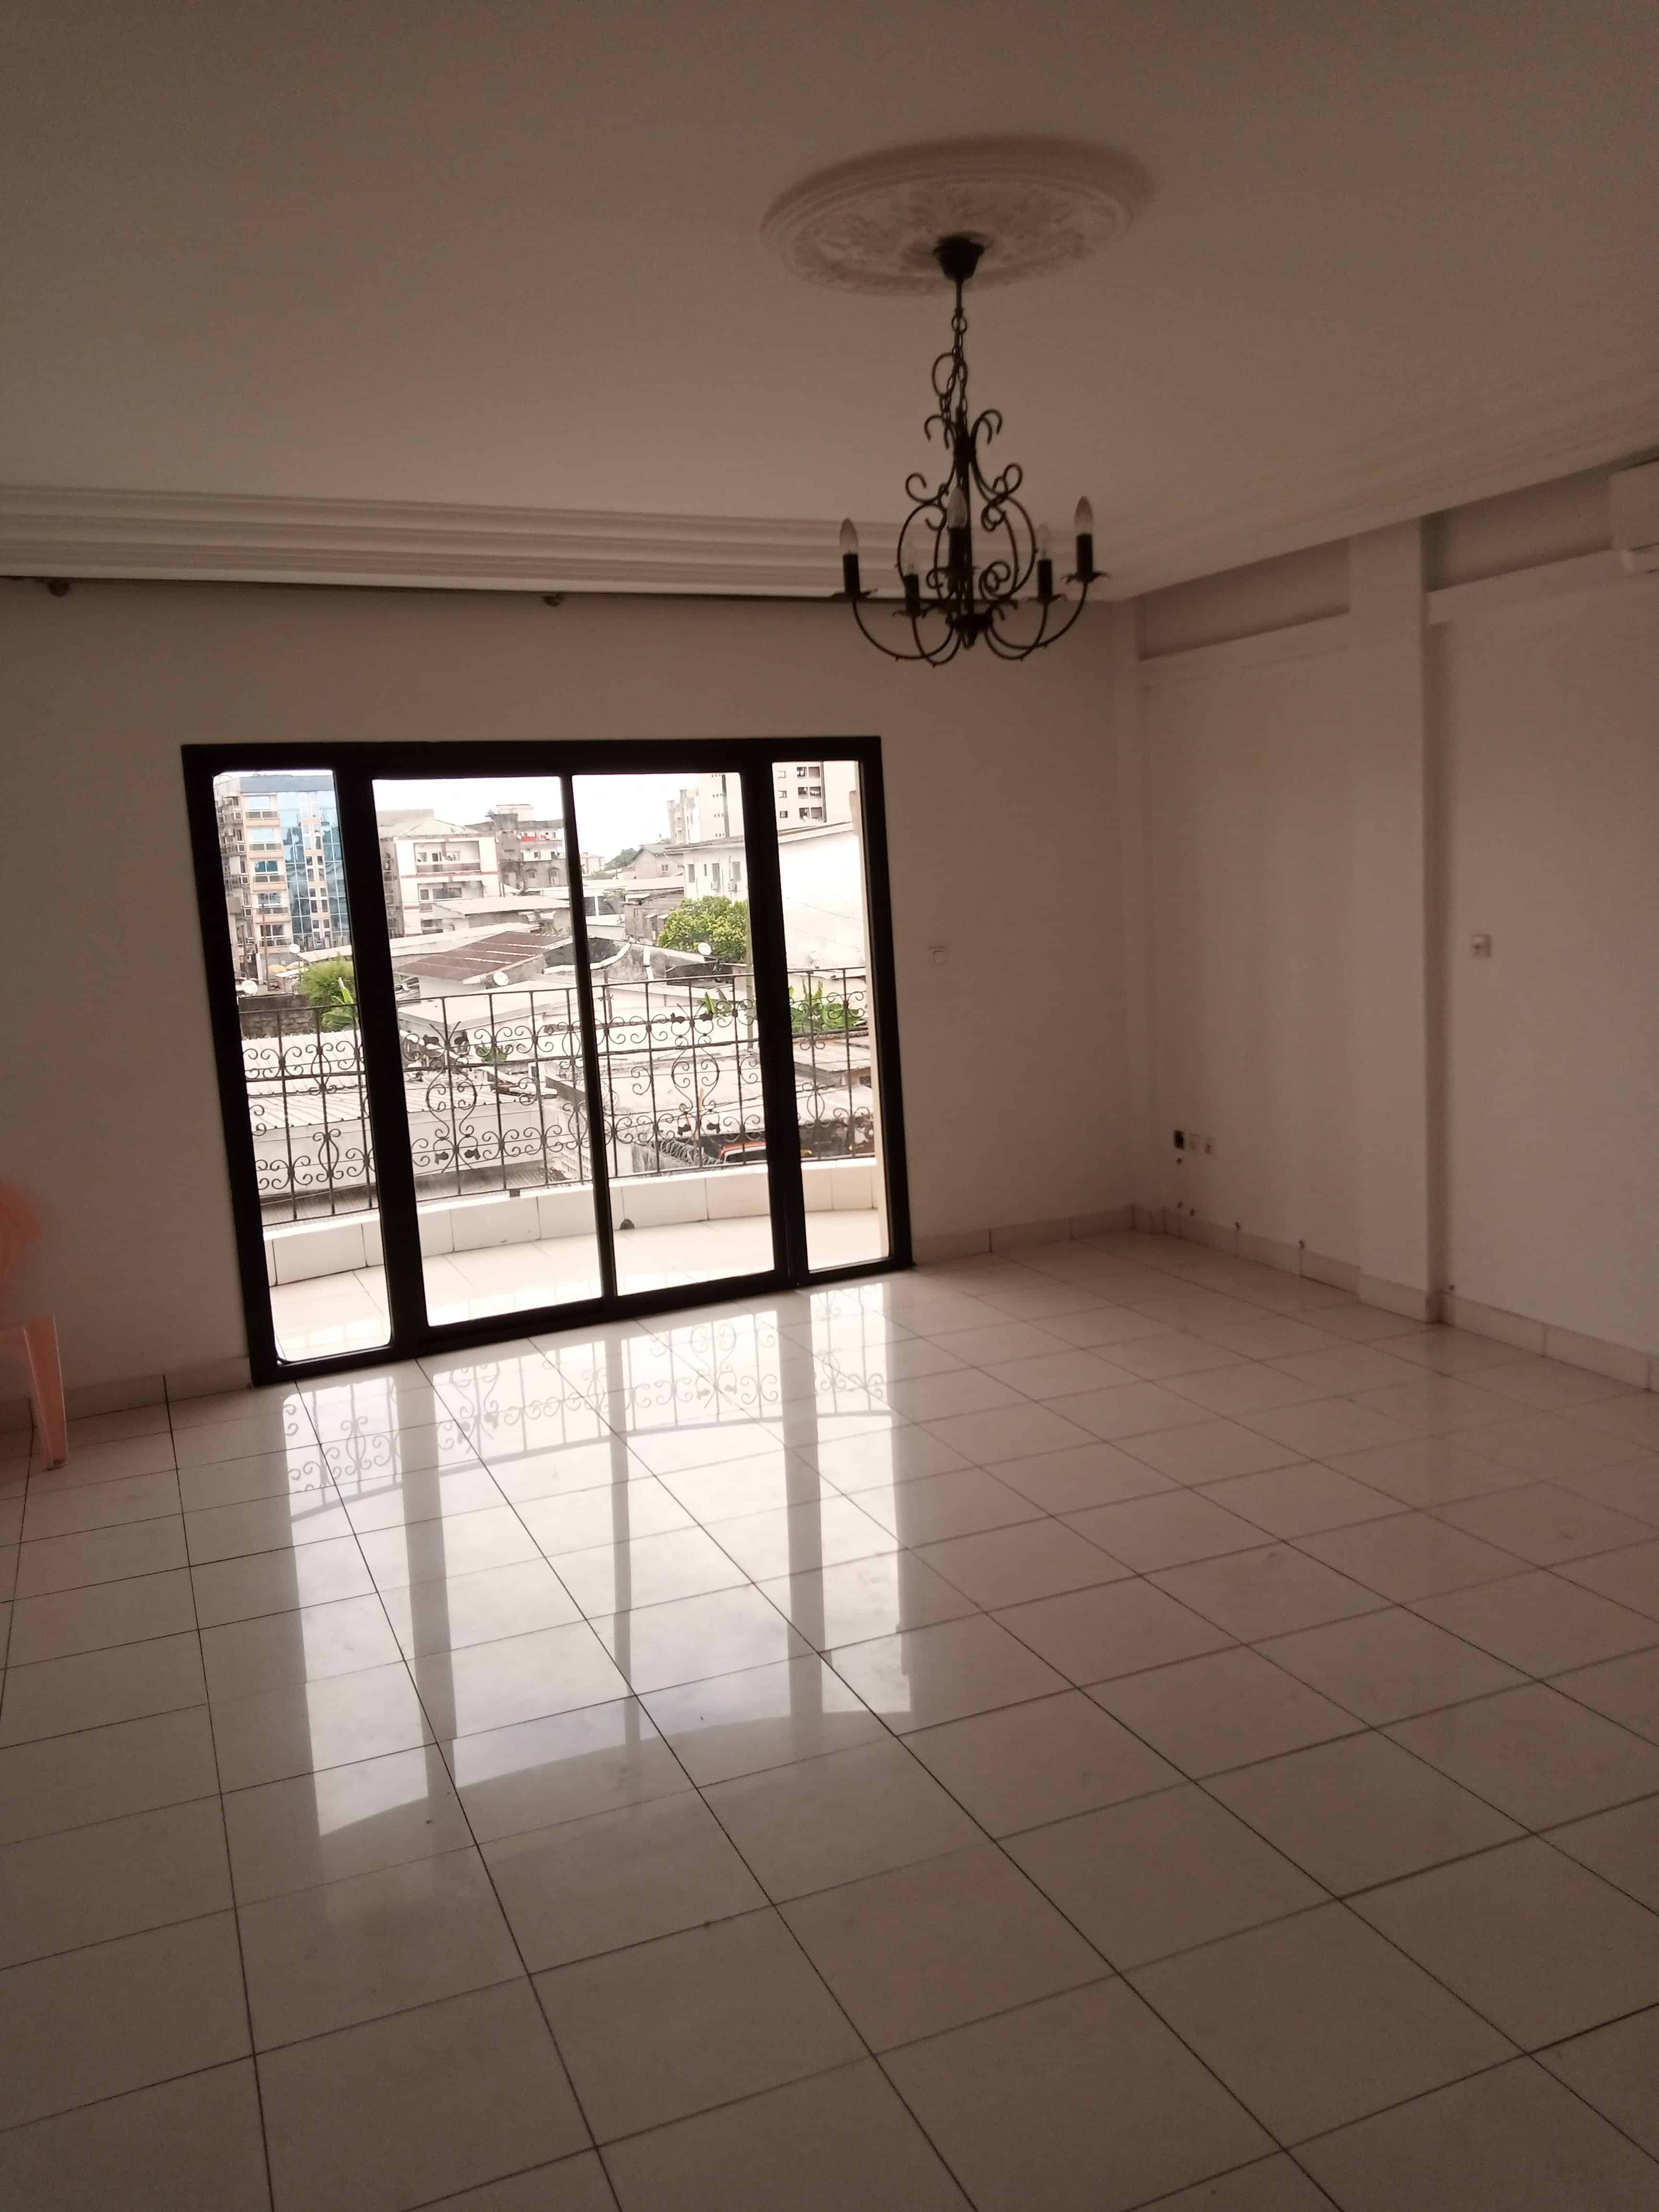 Apartment to rent - Douala, Bali, Sonel - 1 living room(s), 3 bedroom(s), 3 bathroom(s) - 750 000 FCFA / month